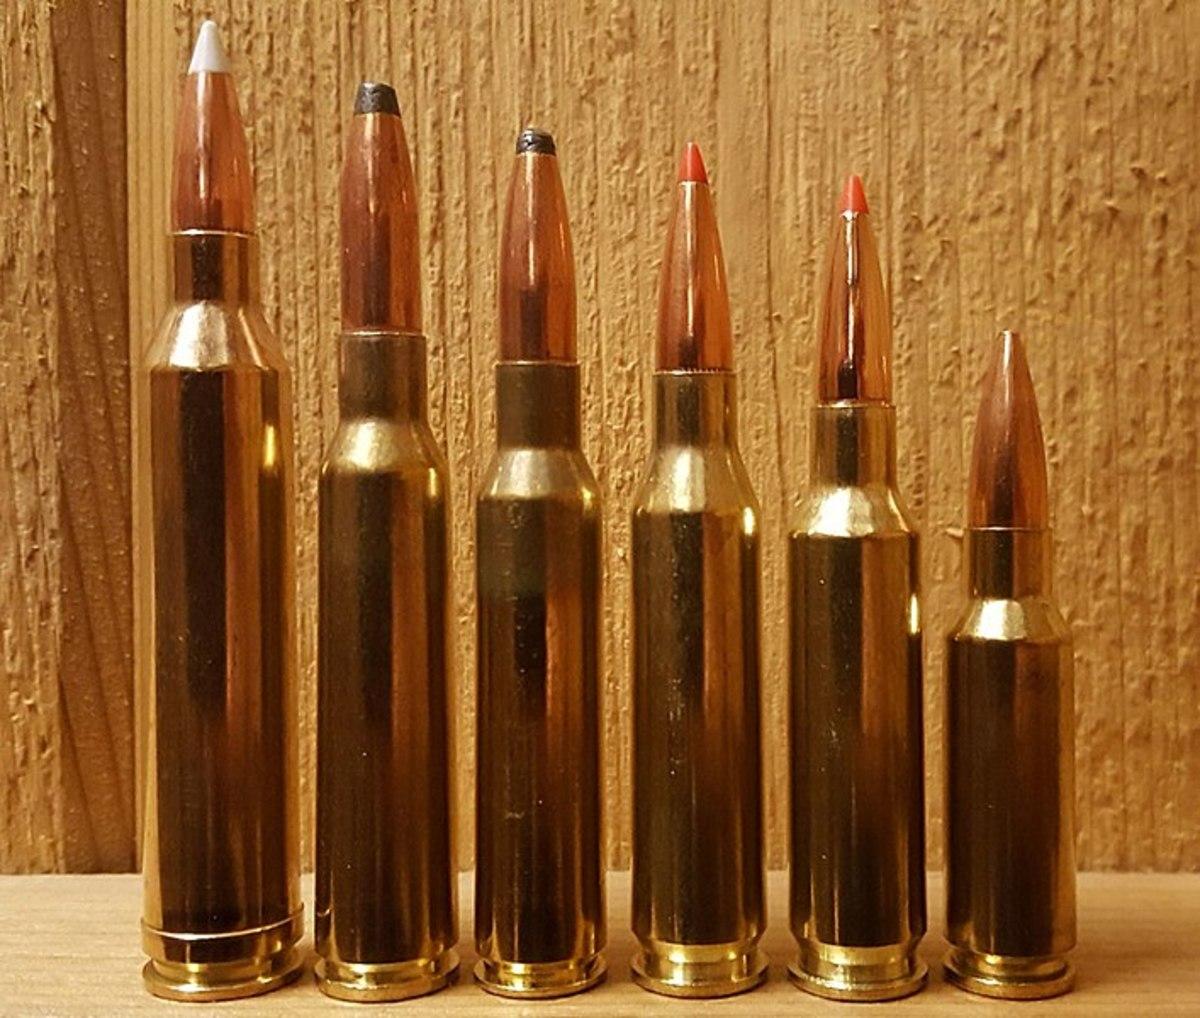 New 6.5mm Cartridge Fight (6.5 PRC vs. its NextGen Competition)